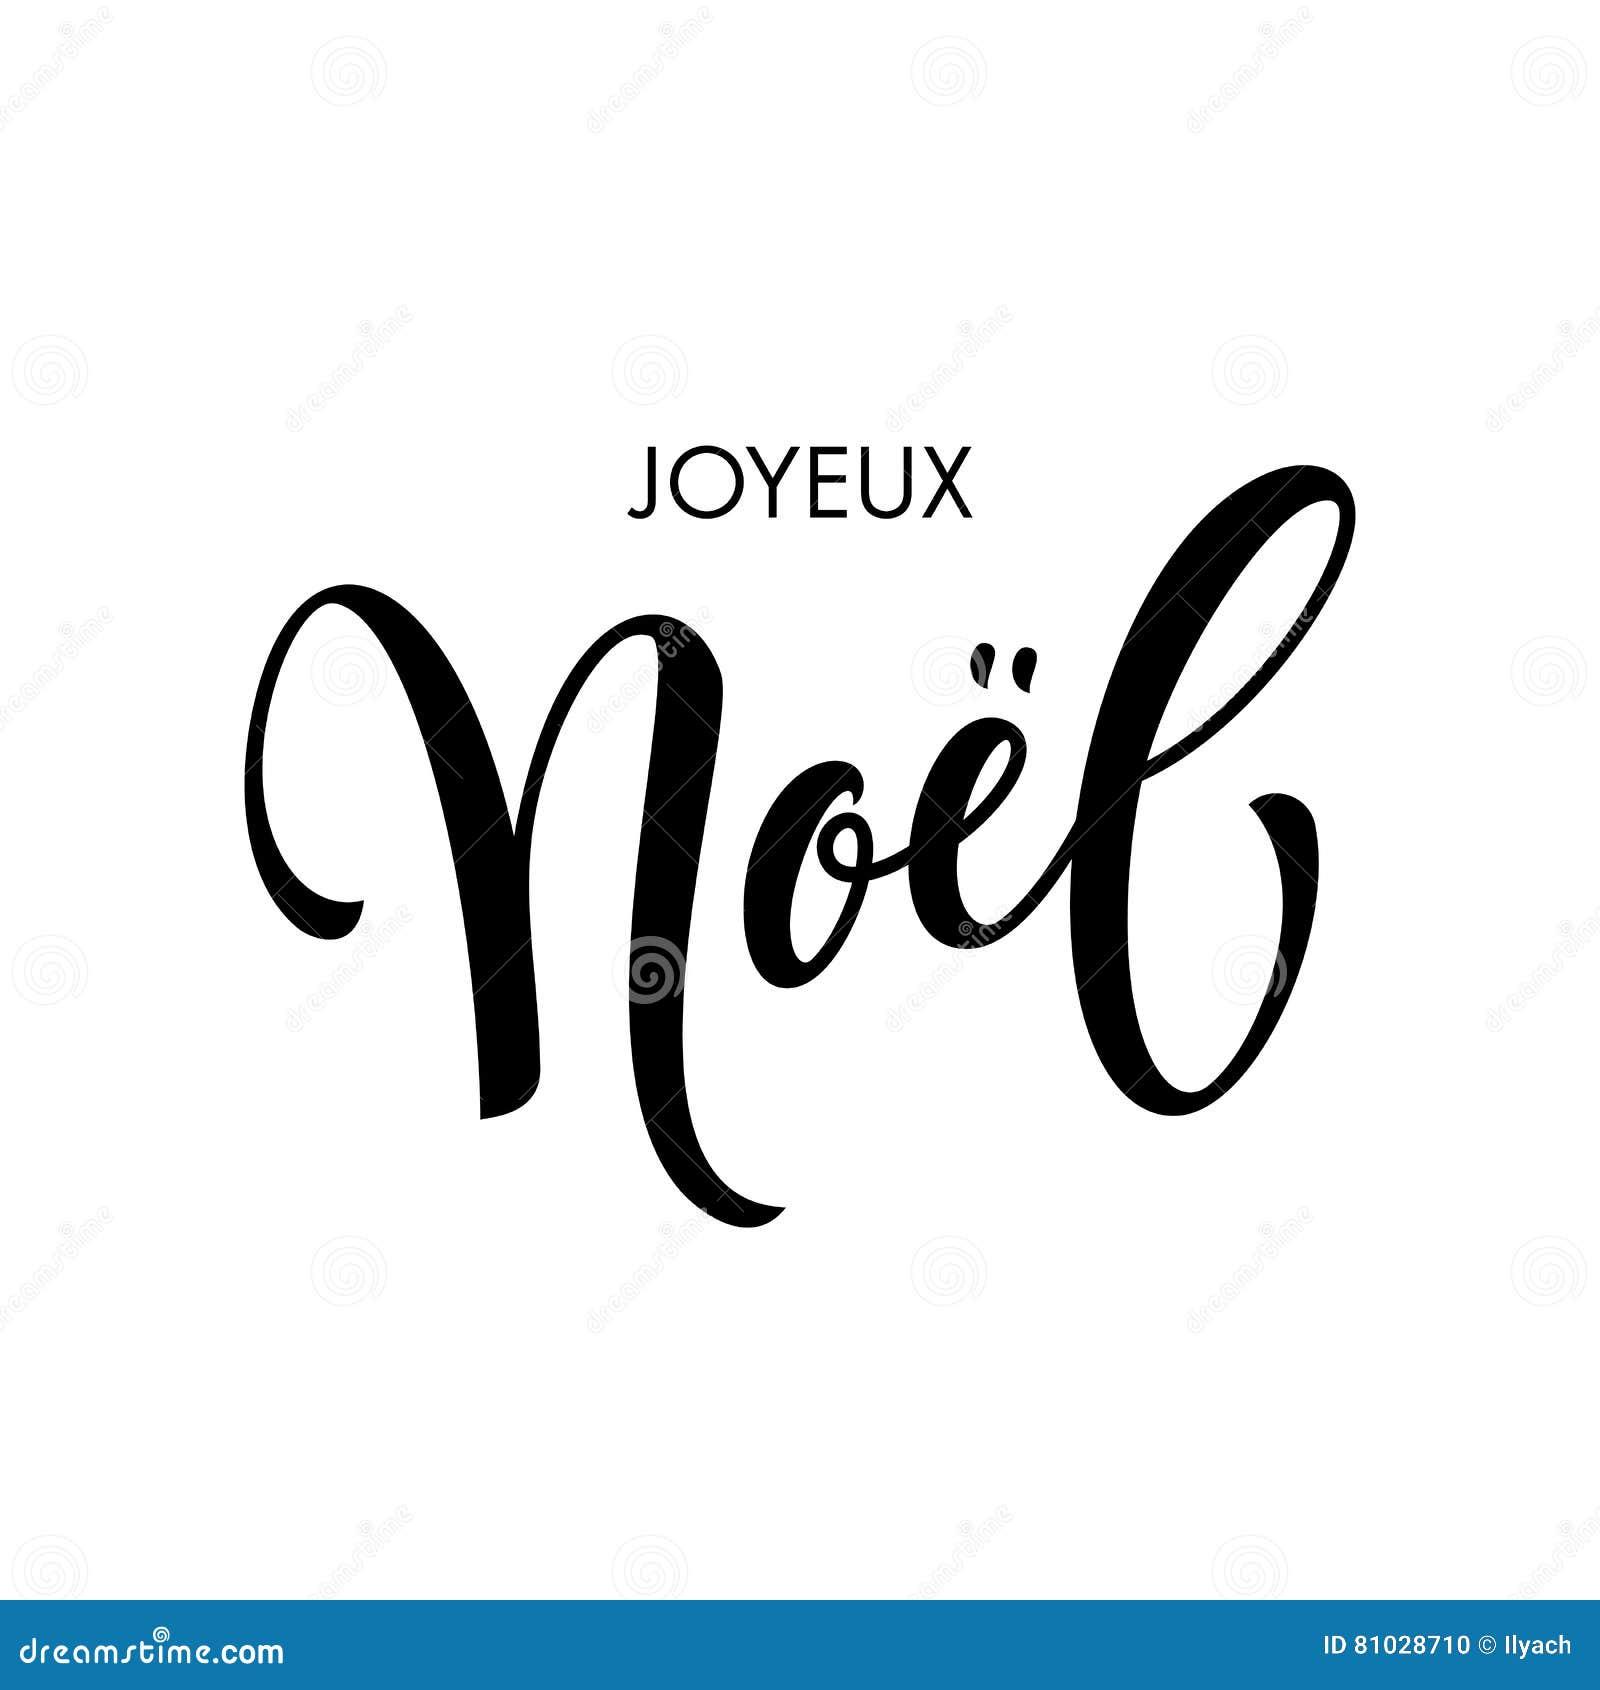 French Merry Christmas Joyeux Noel Calligraphy Text